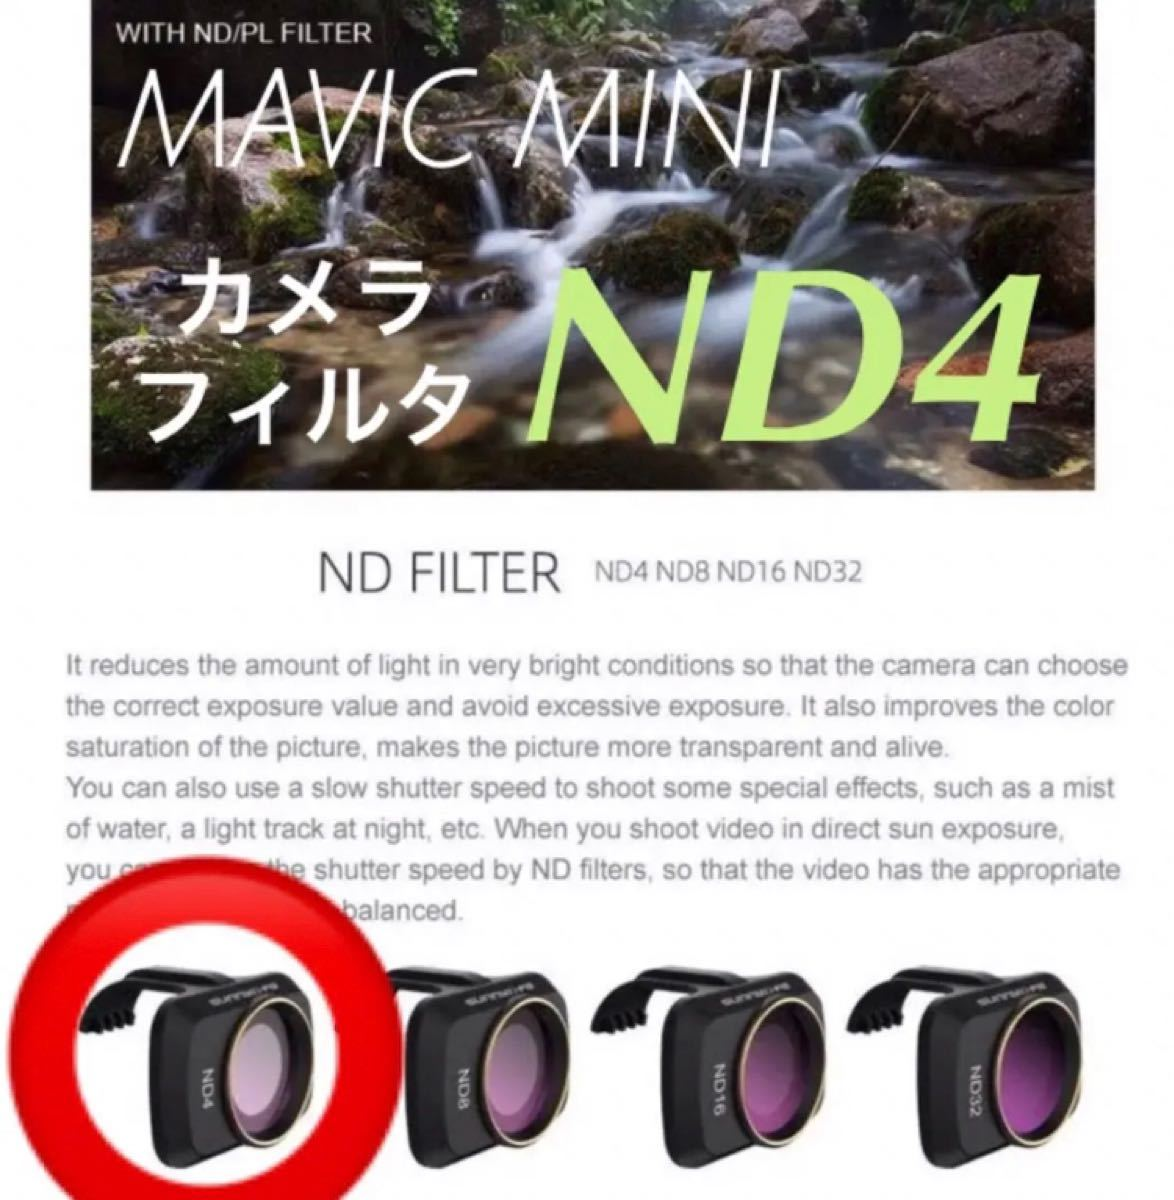 ☆ND4レンズフィルター★MAVIC MINI / DJI MINI 2